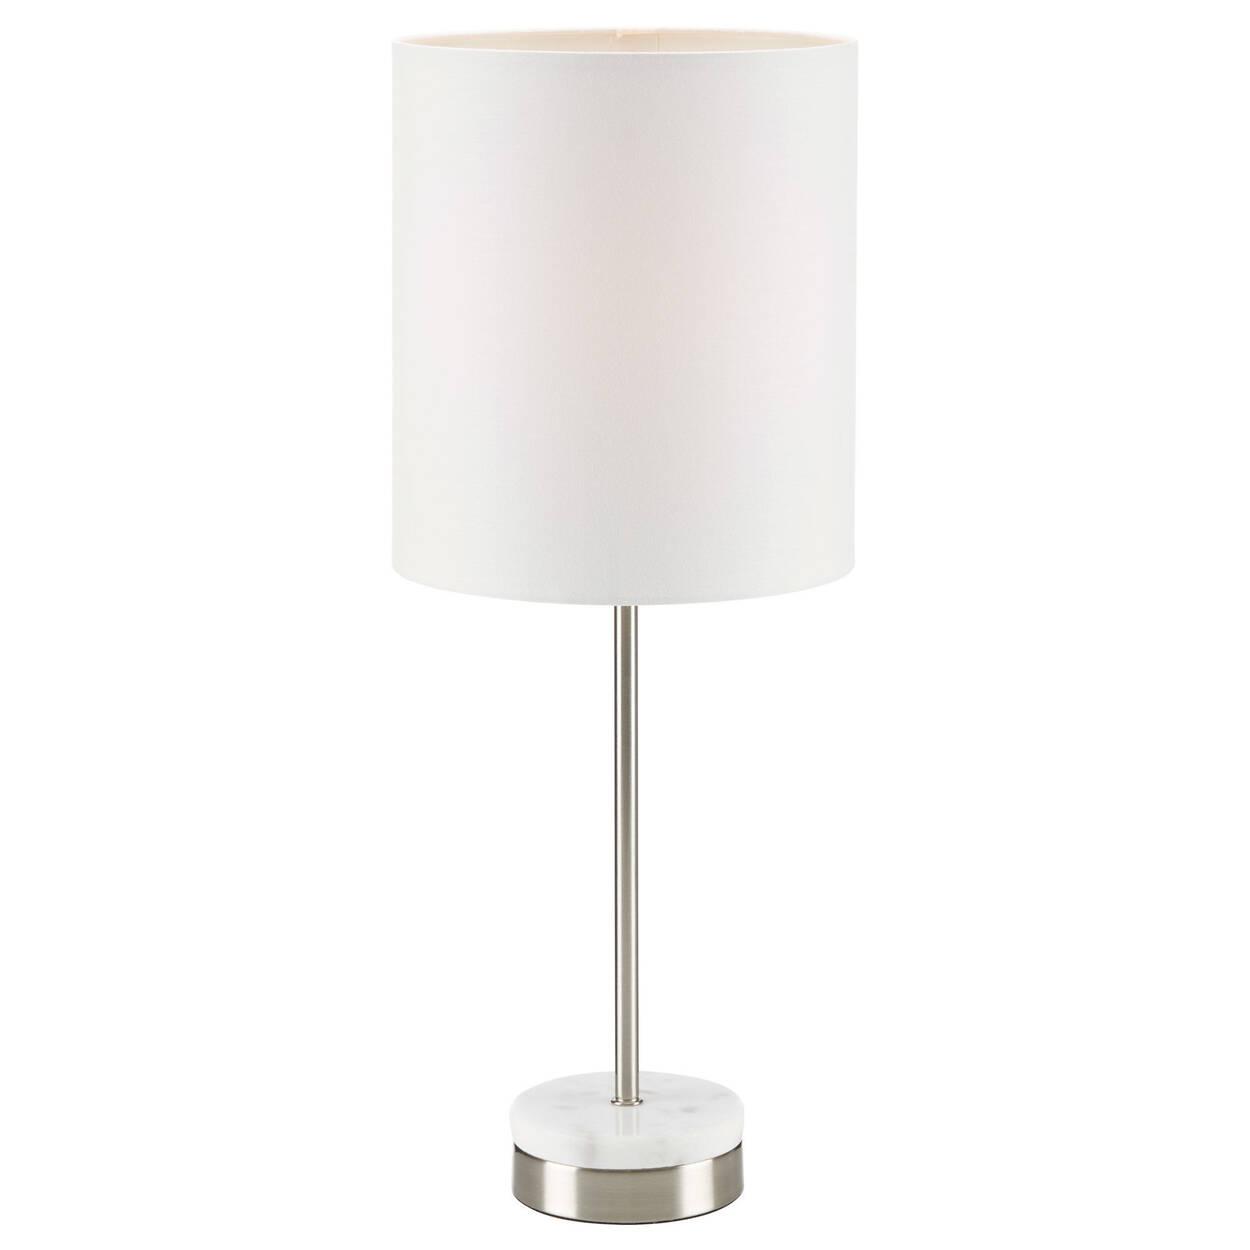 Lampe de table en métal et en marbre